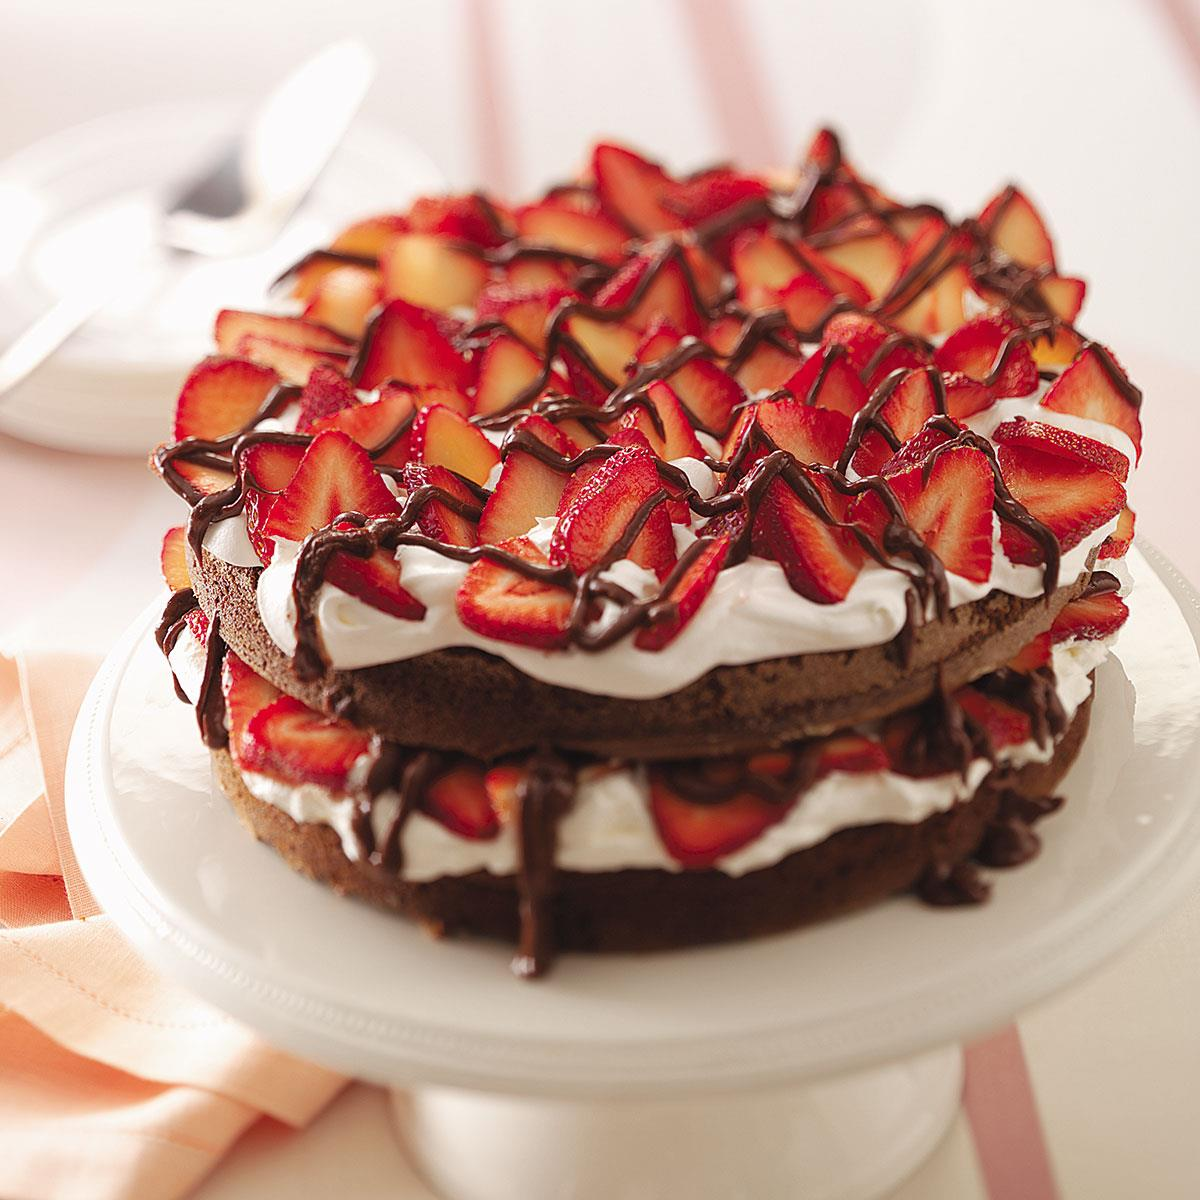 Chocolate Strawberry Torte Recipe How To Make It Taste Of Home